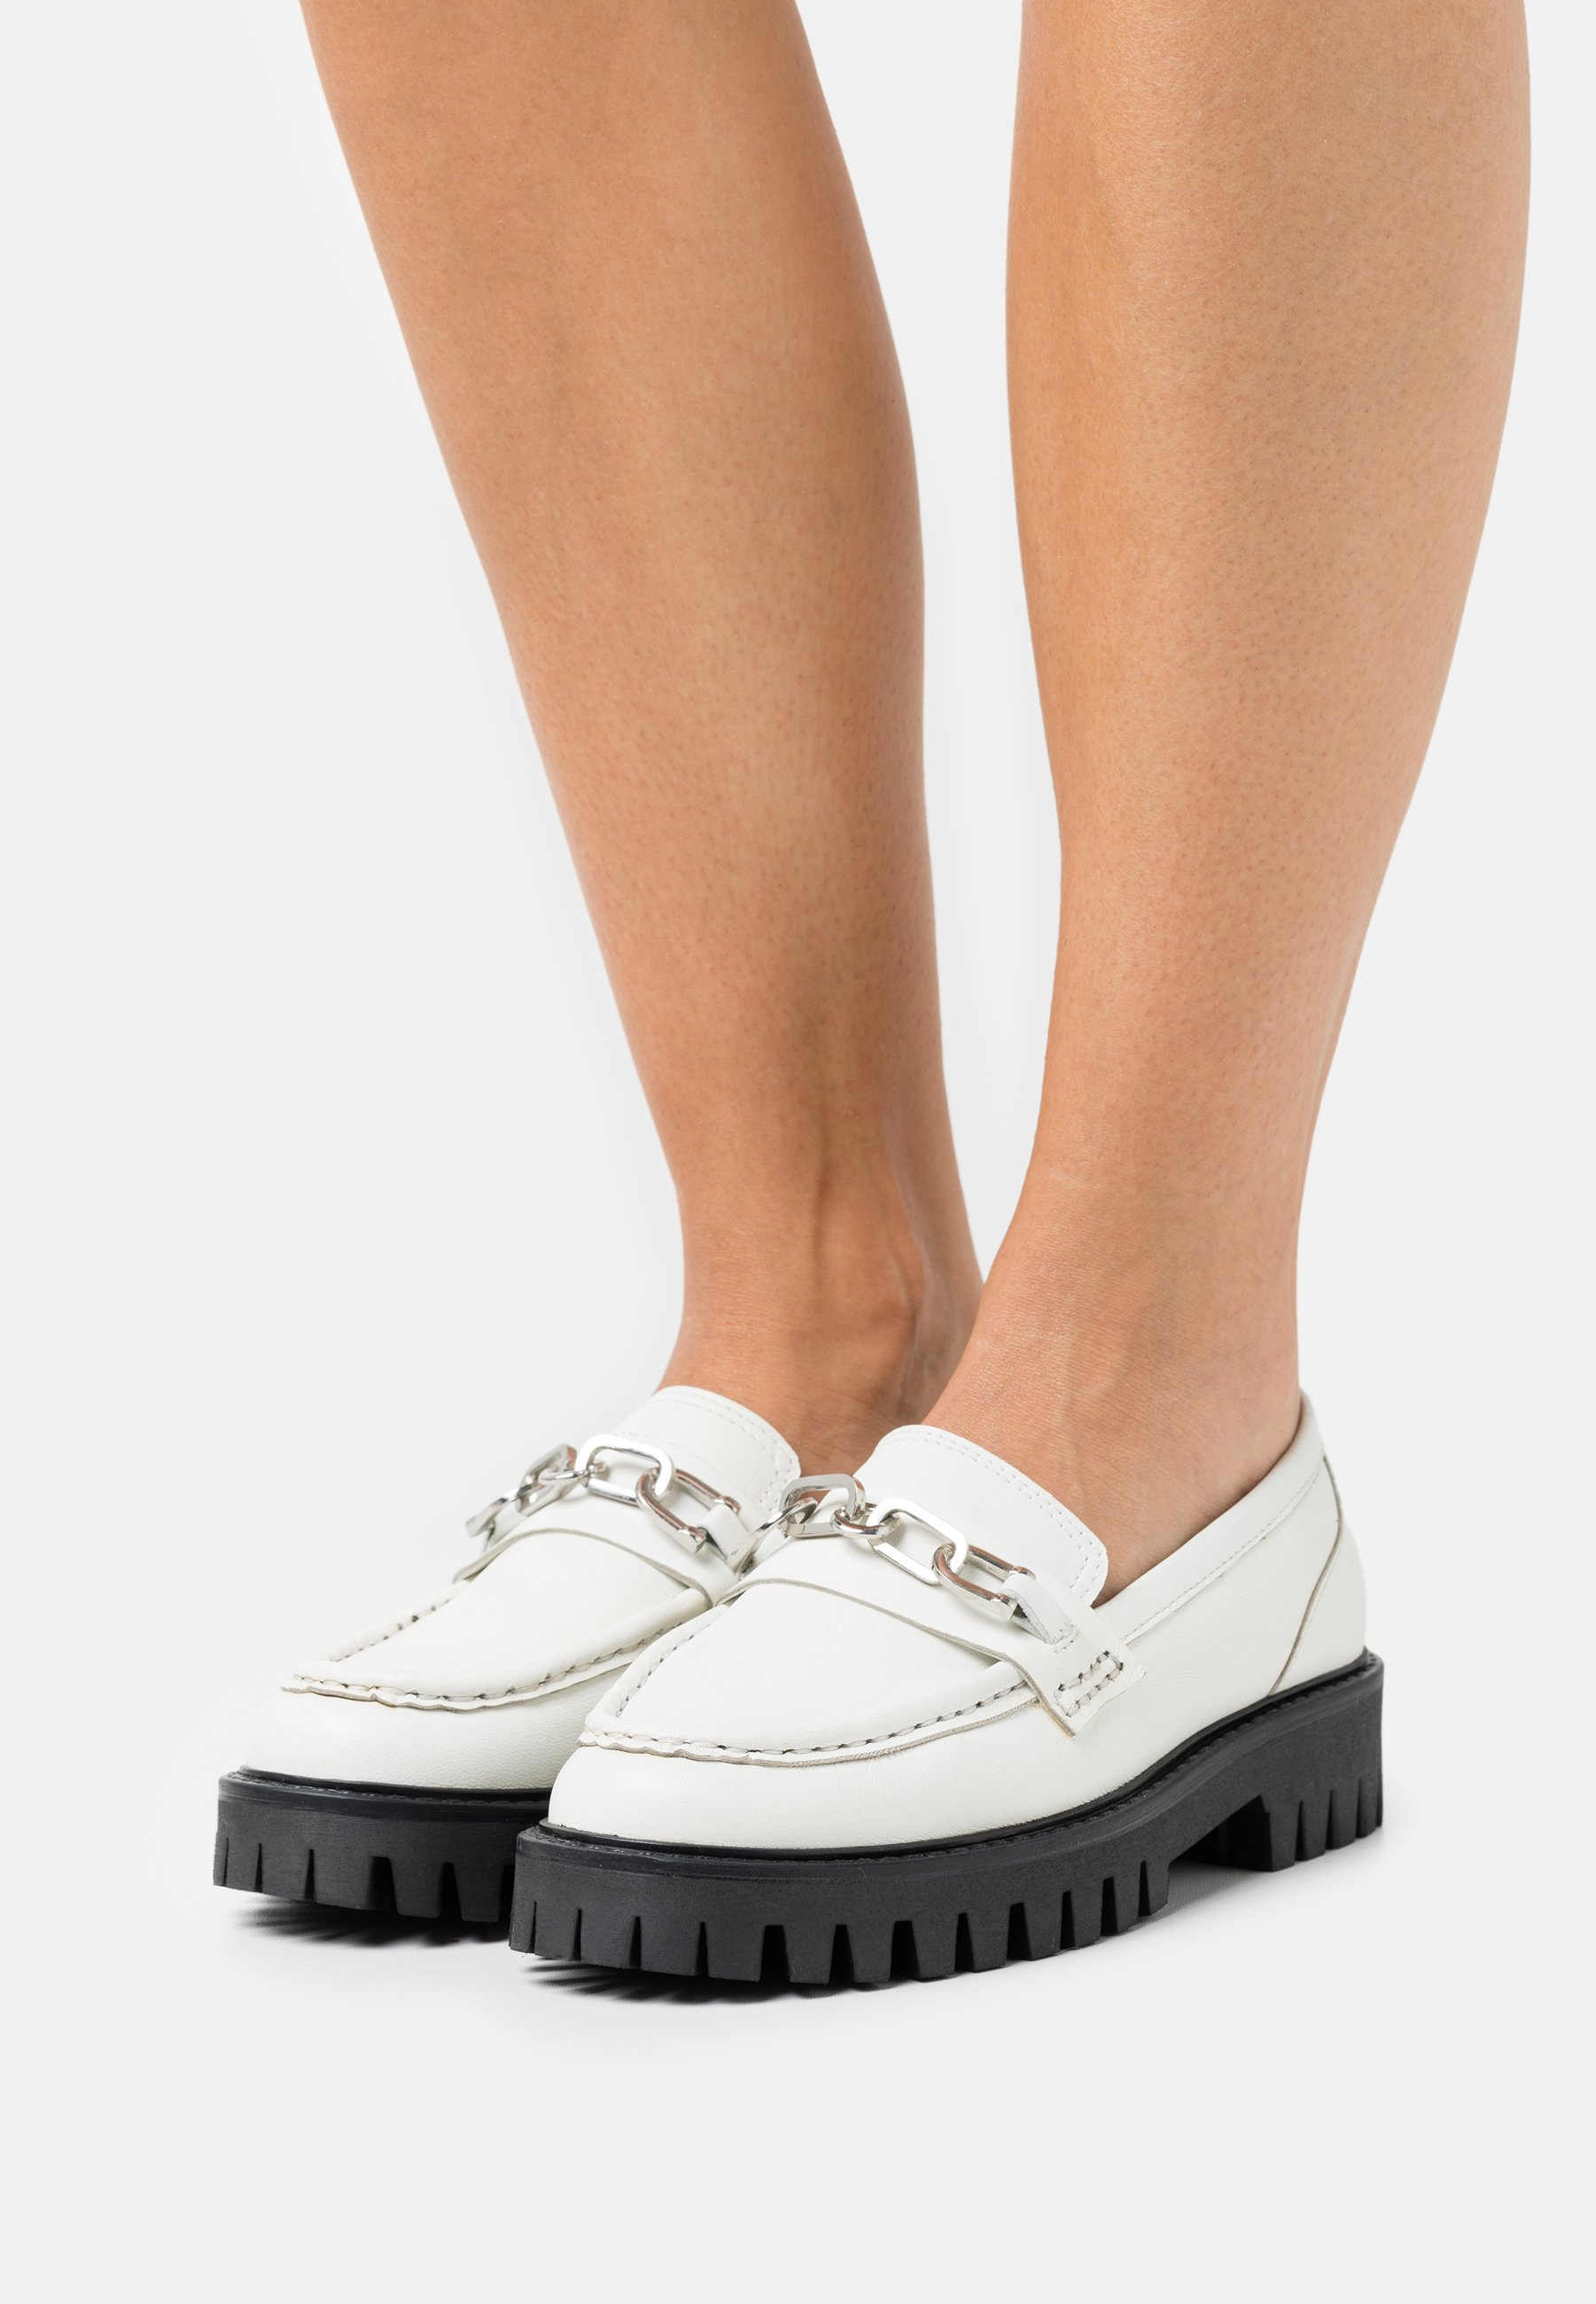 Women FREYA - Slip-ons - white